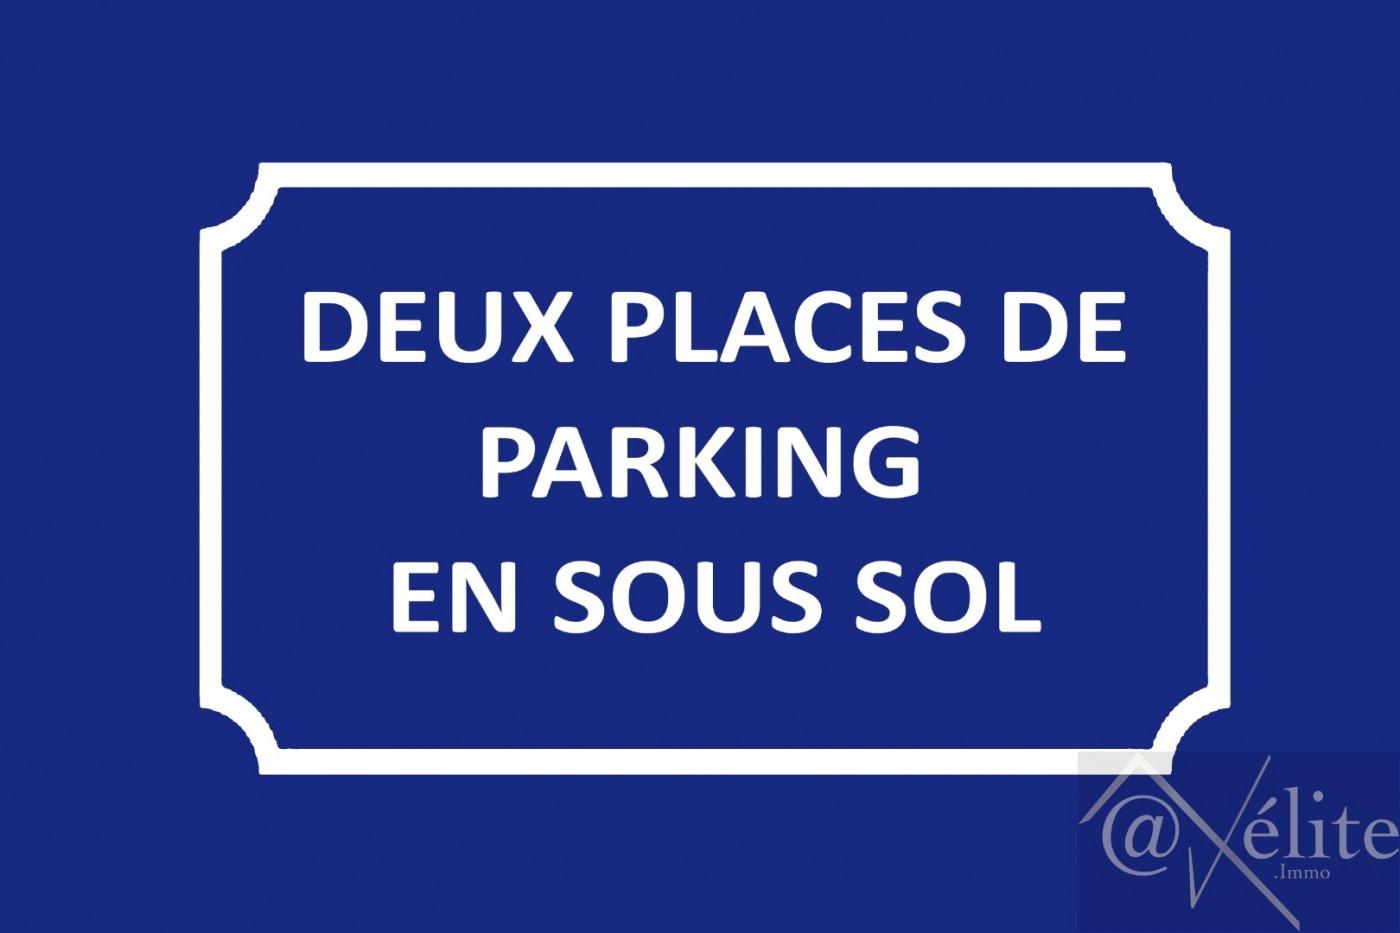 A vendre Chartres 777923287 Axelite sas